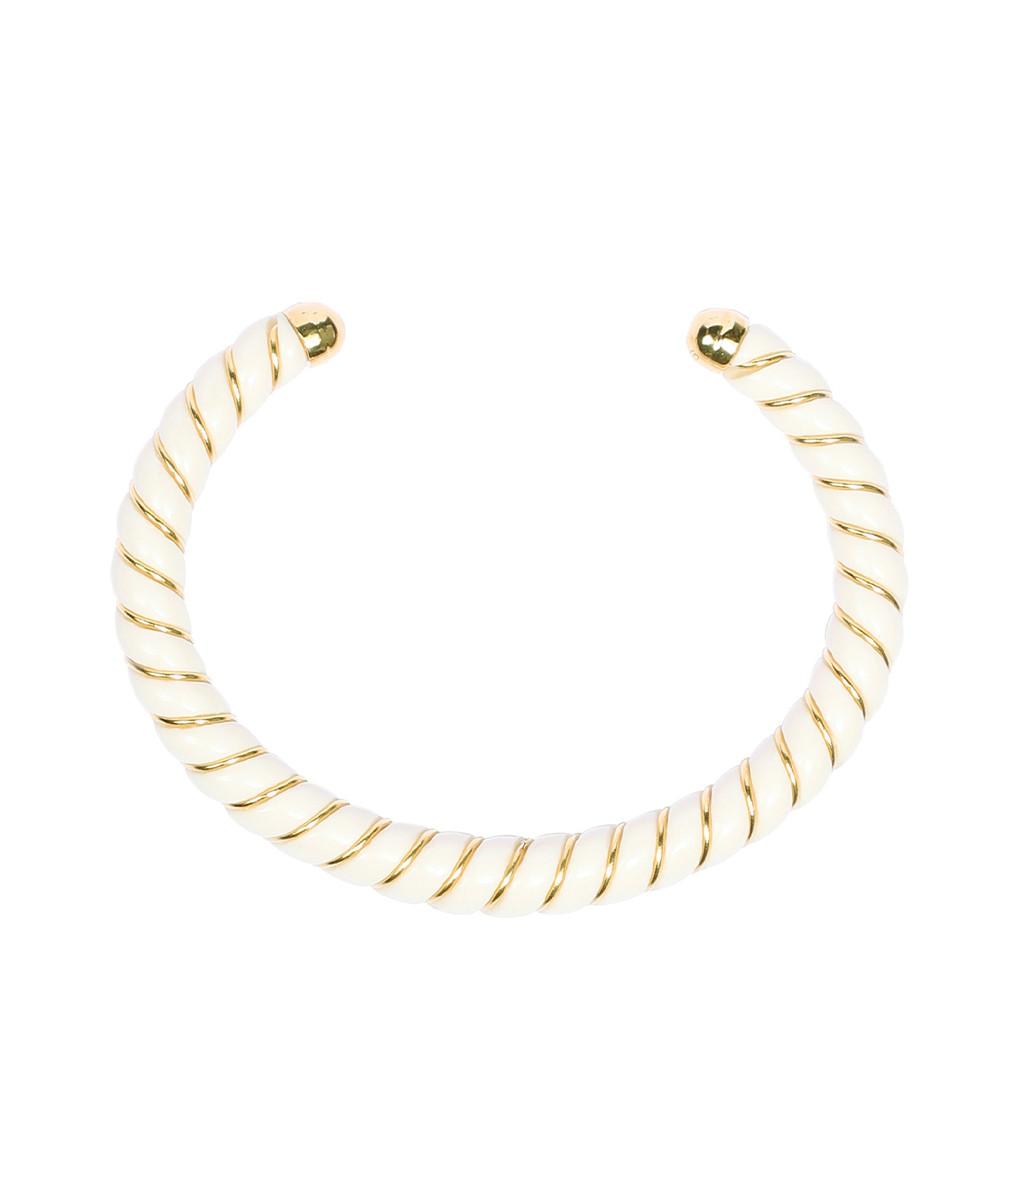 AURELIE BIDERMANN - Bracelet New Diana Ivoire, Exclusivité Lulli